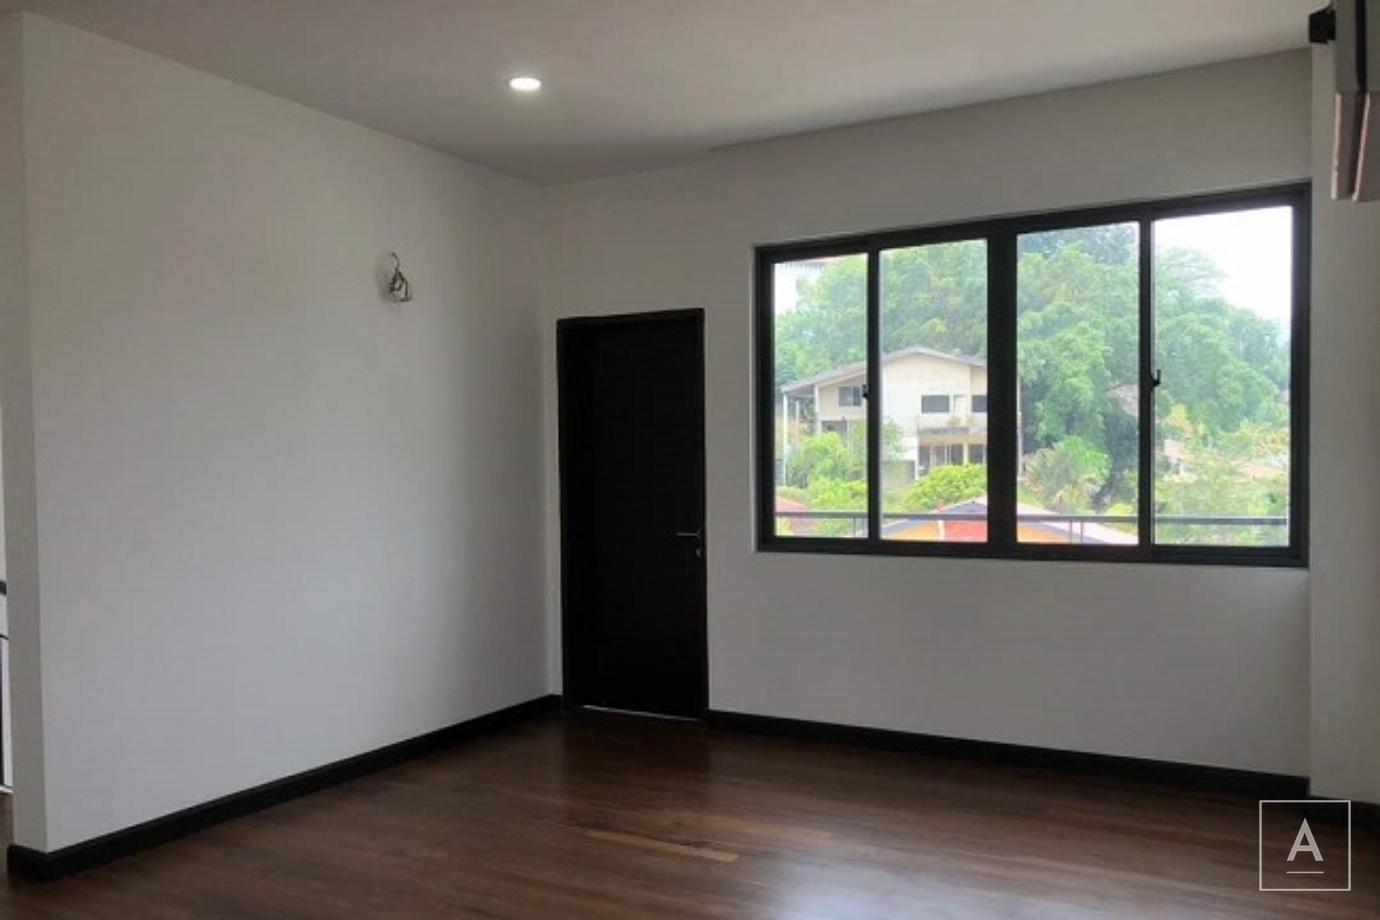 10 Damansara, Damansara Heights,Kuala Lumpur, 5 Bedrooms Bedrooms, ,6 BathroomsBathrooms,Condominium / Serviced Residence,For Sale,10 Damansara,2186